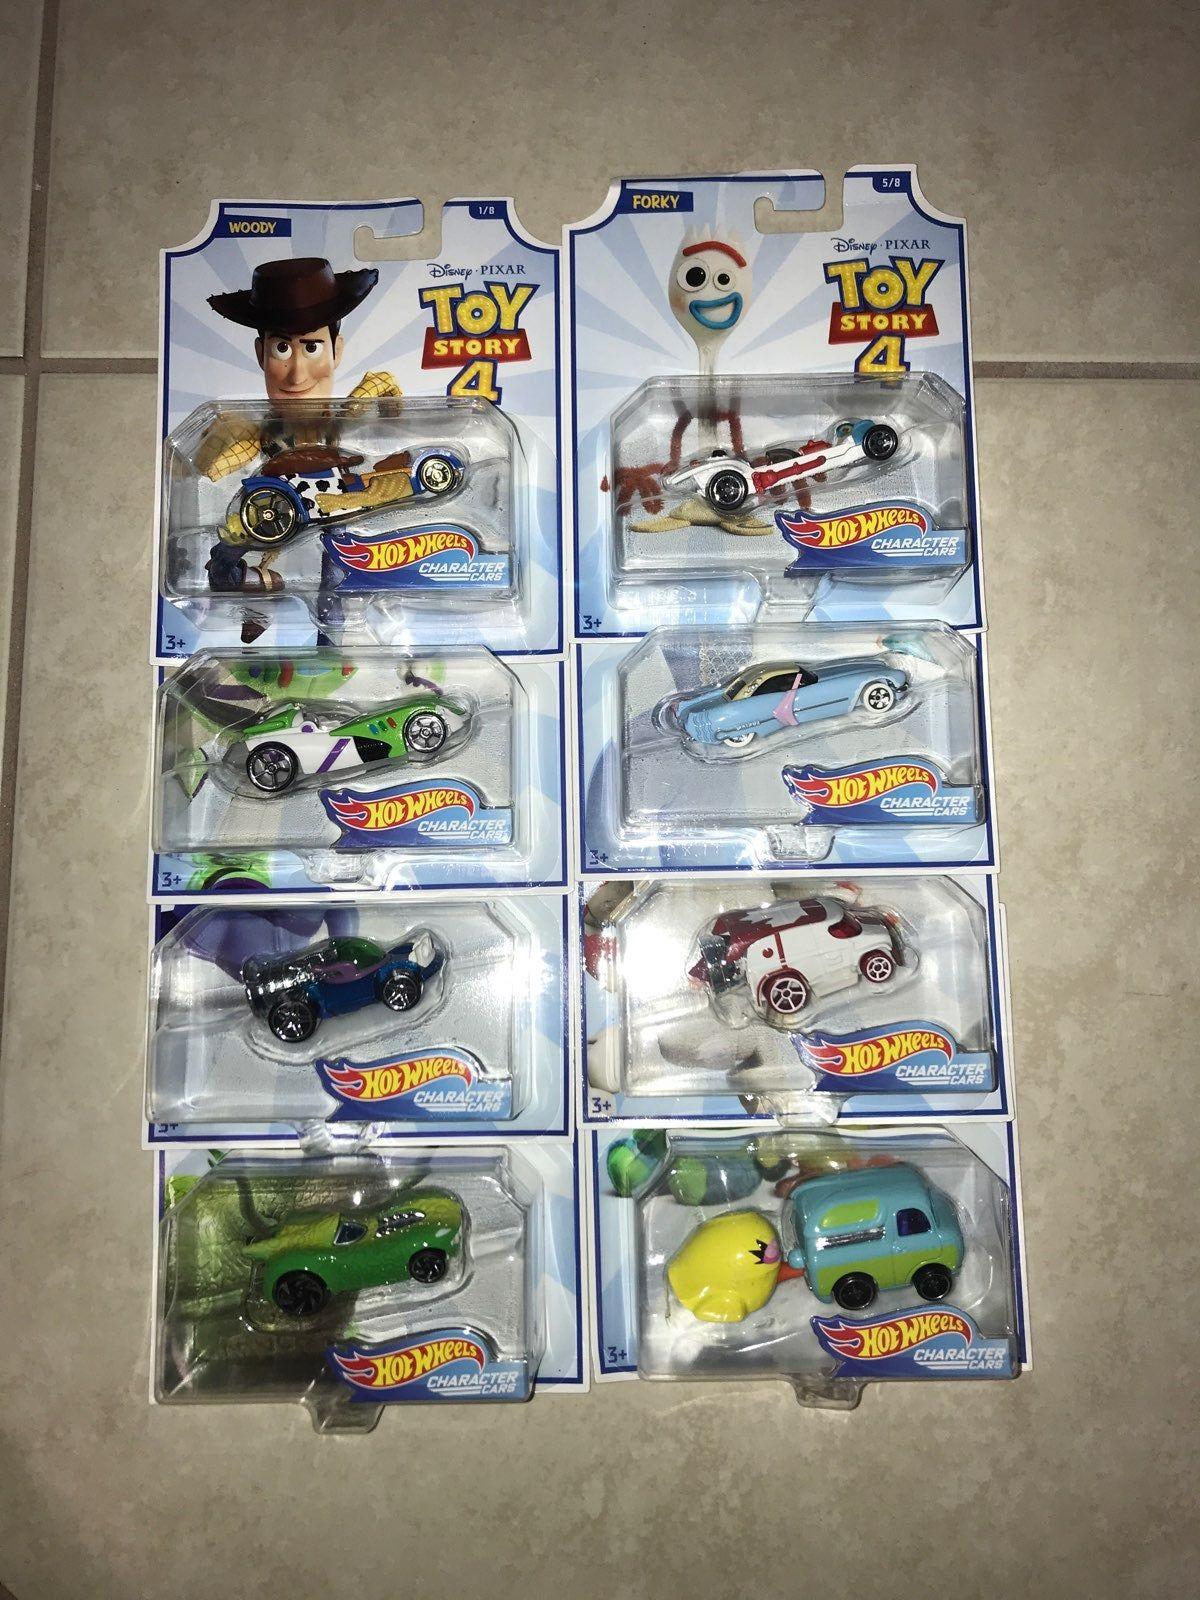 You Story 4 Disney Pixar Hot Wheels Character Cars Set Of 8 Woody Buzz Lightyear Alien Rex Forky Bo Peep Duke Caboom Ducky Hot Wheels Hot Wheels Cars Car Set